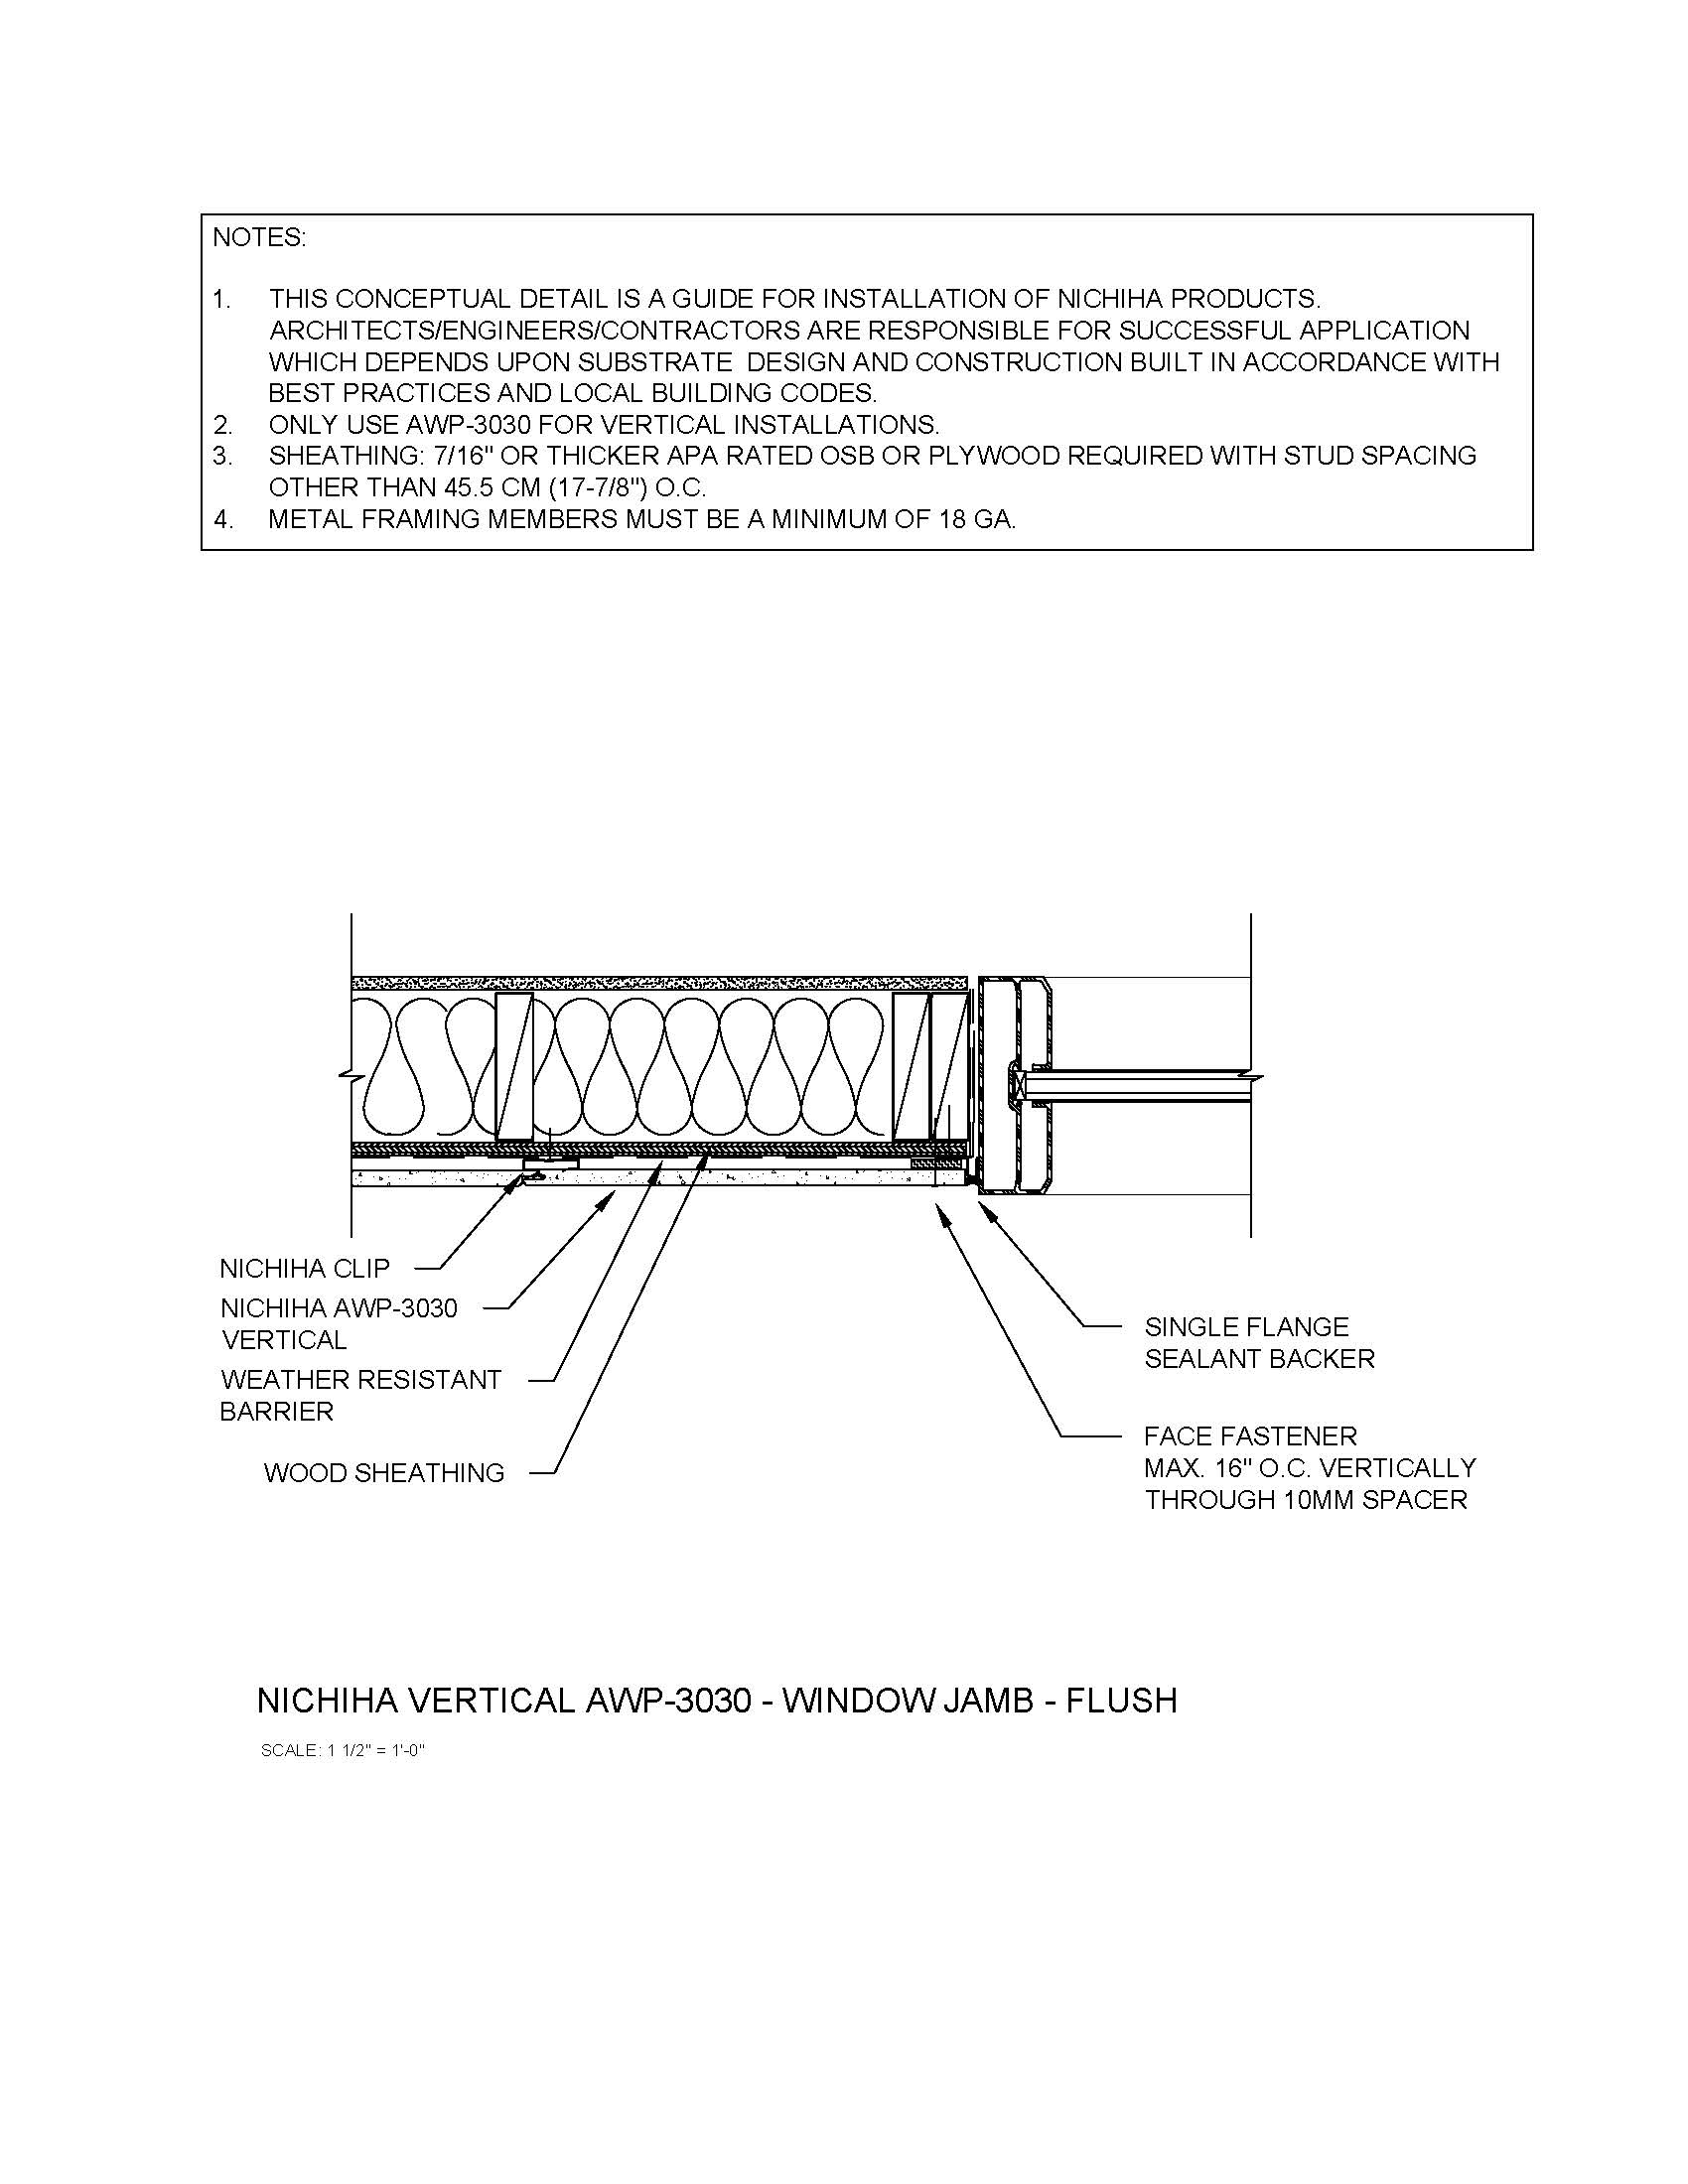 Architectural Details - Fiber Cement | Nichiha USA